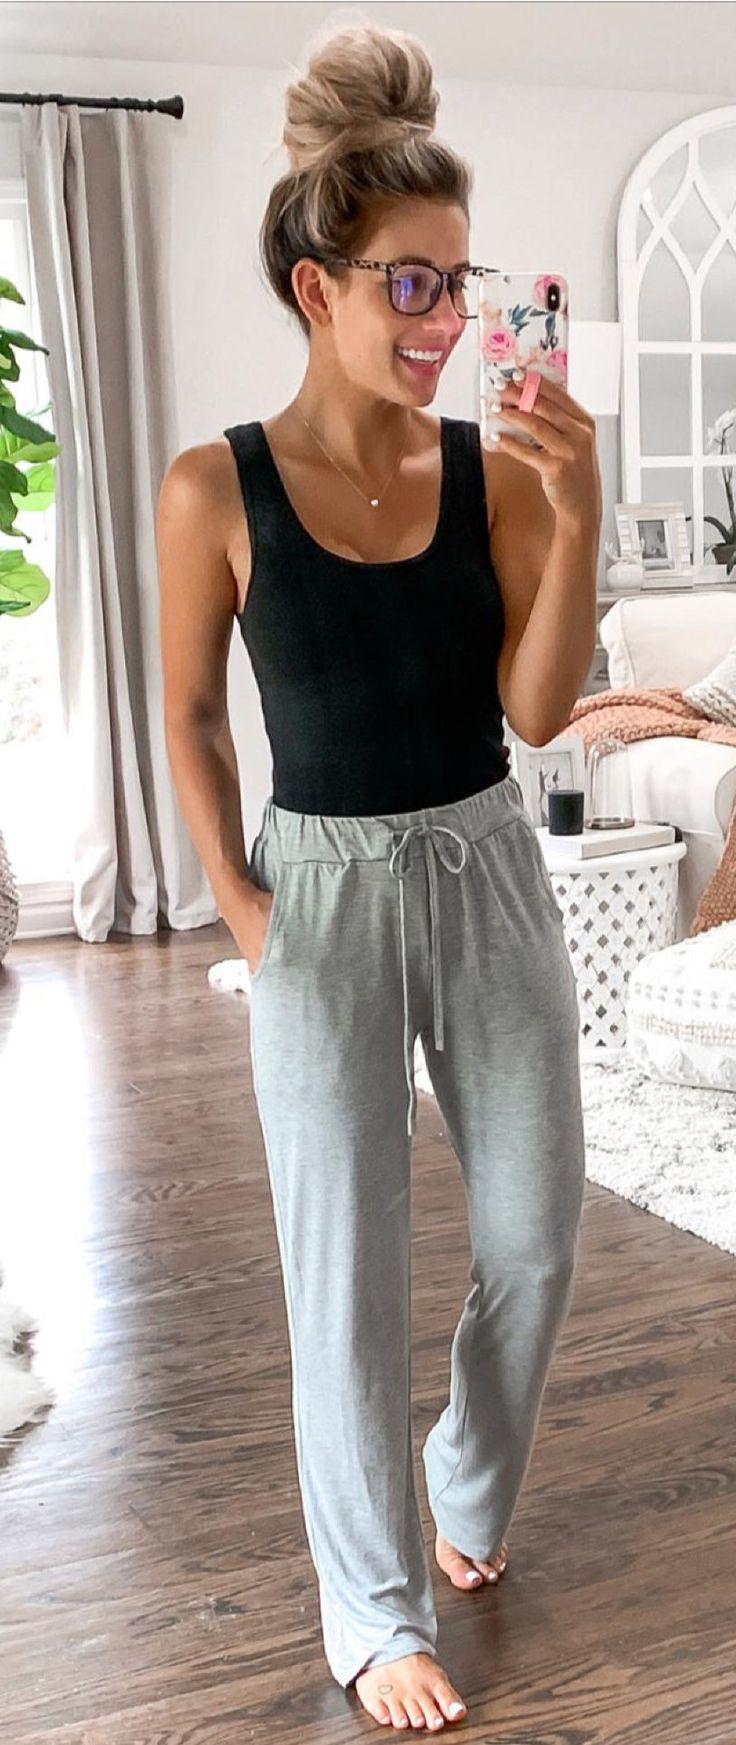 30+ Fabulous Summer Outfits To Copy ASAP – Nikki Gray